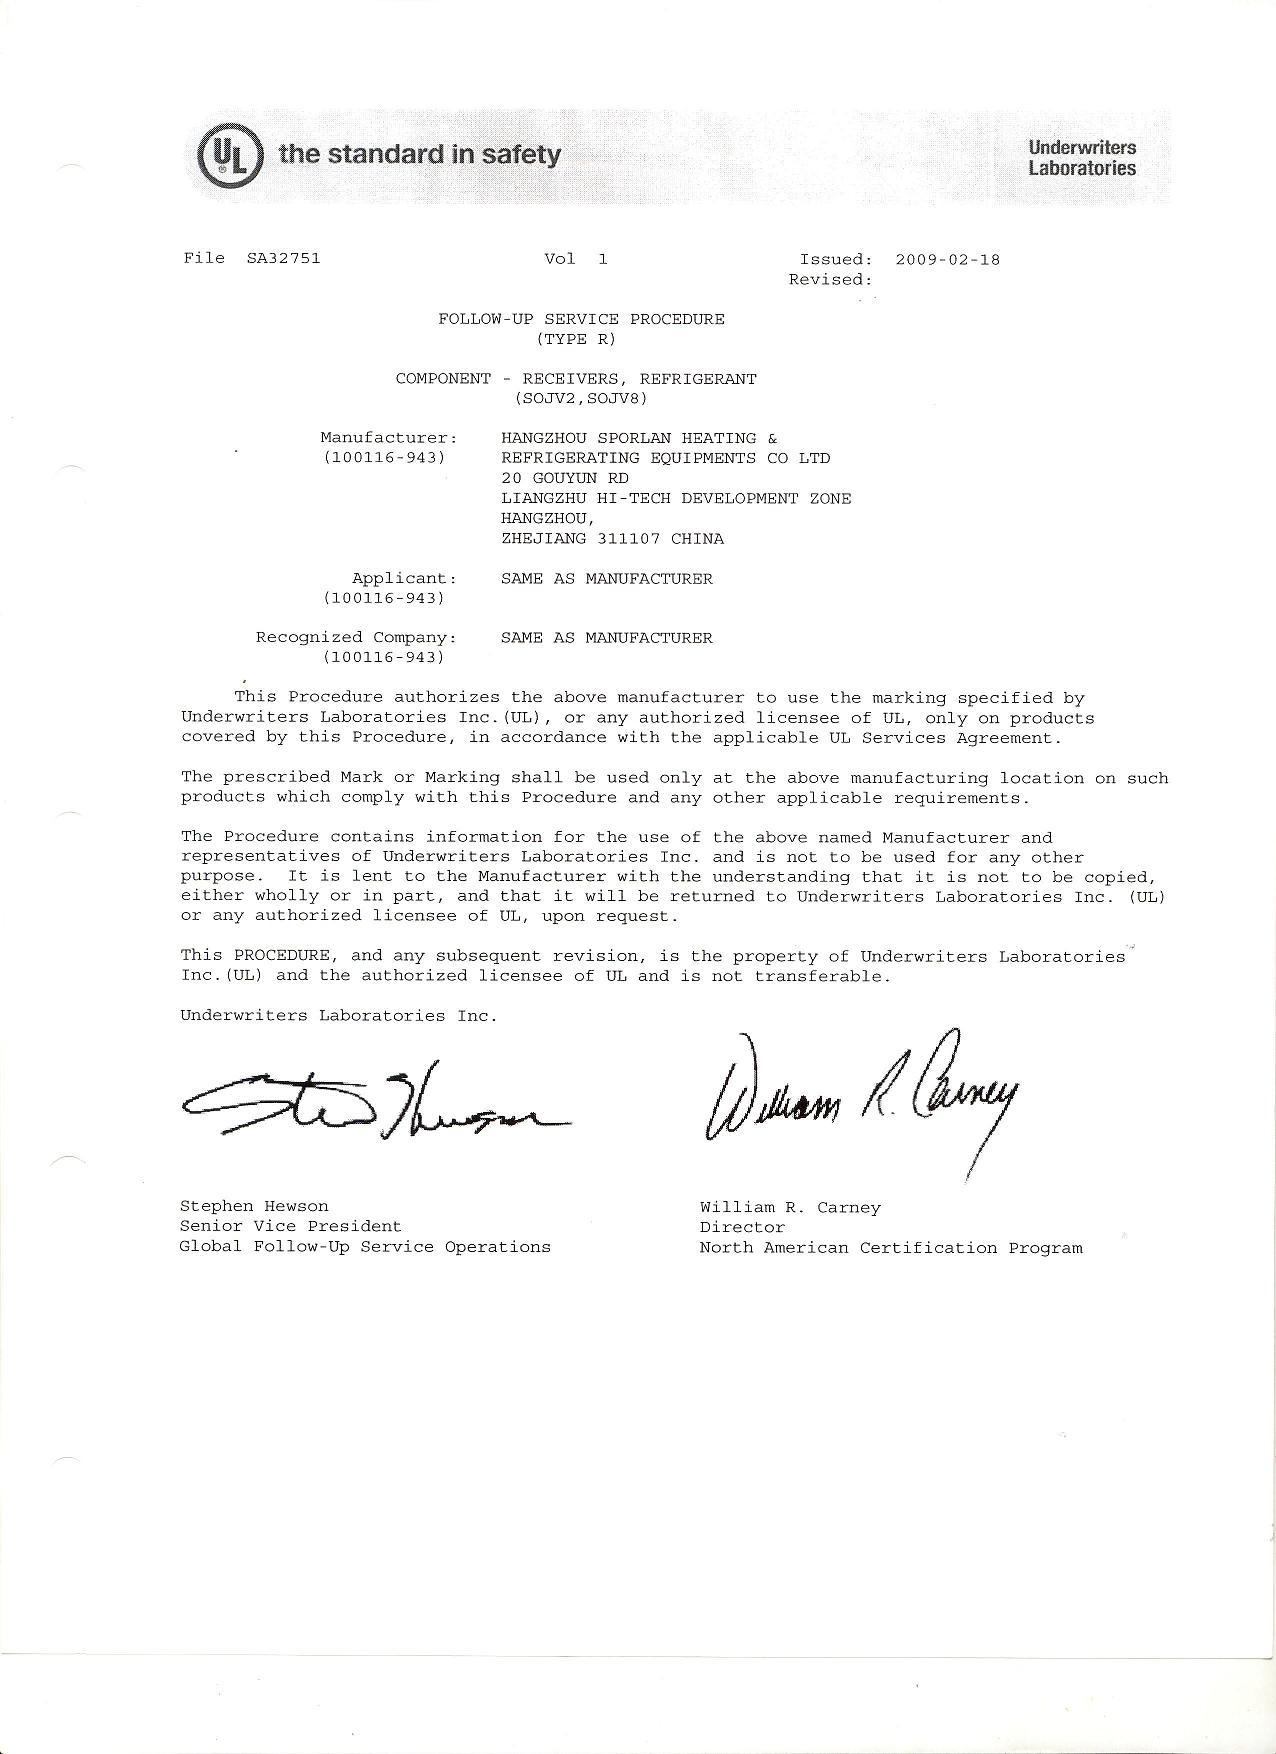 SA32751 UL certificate for accumulator